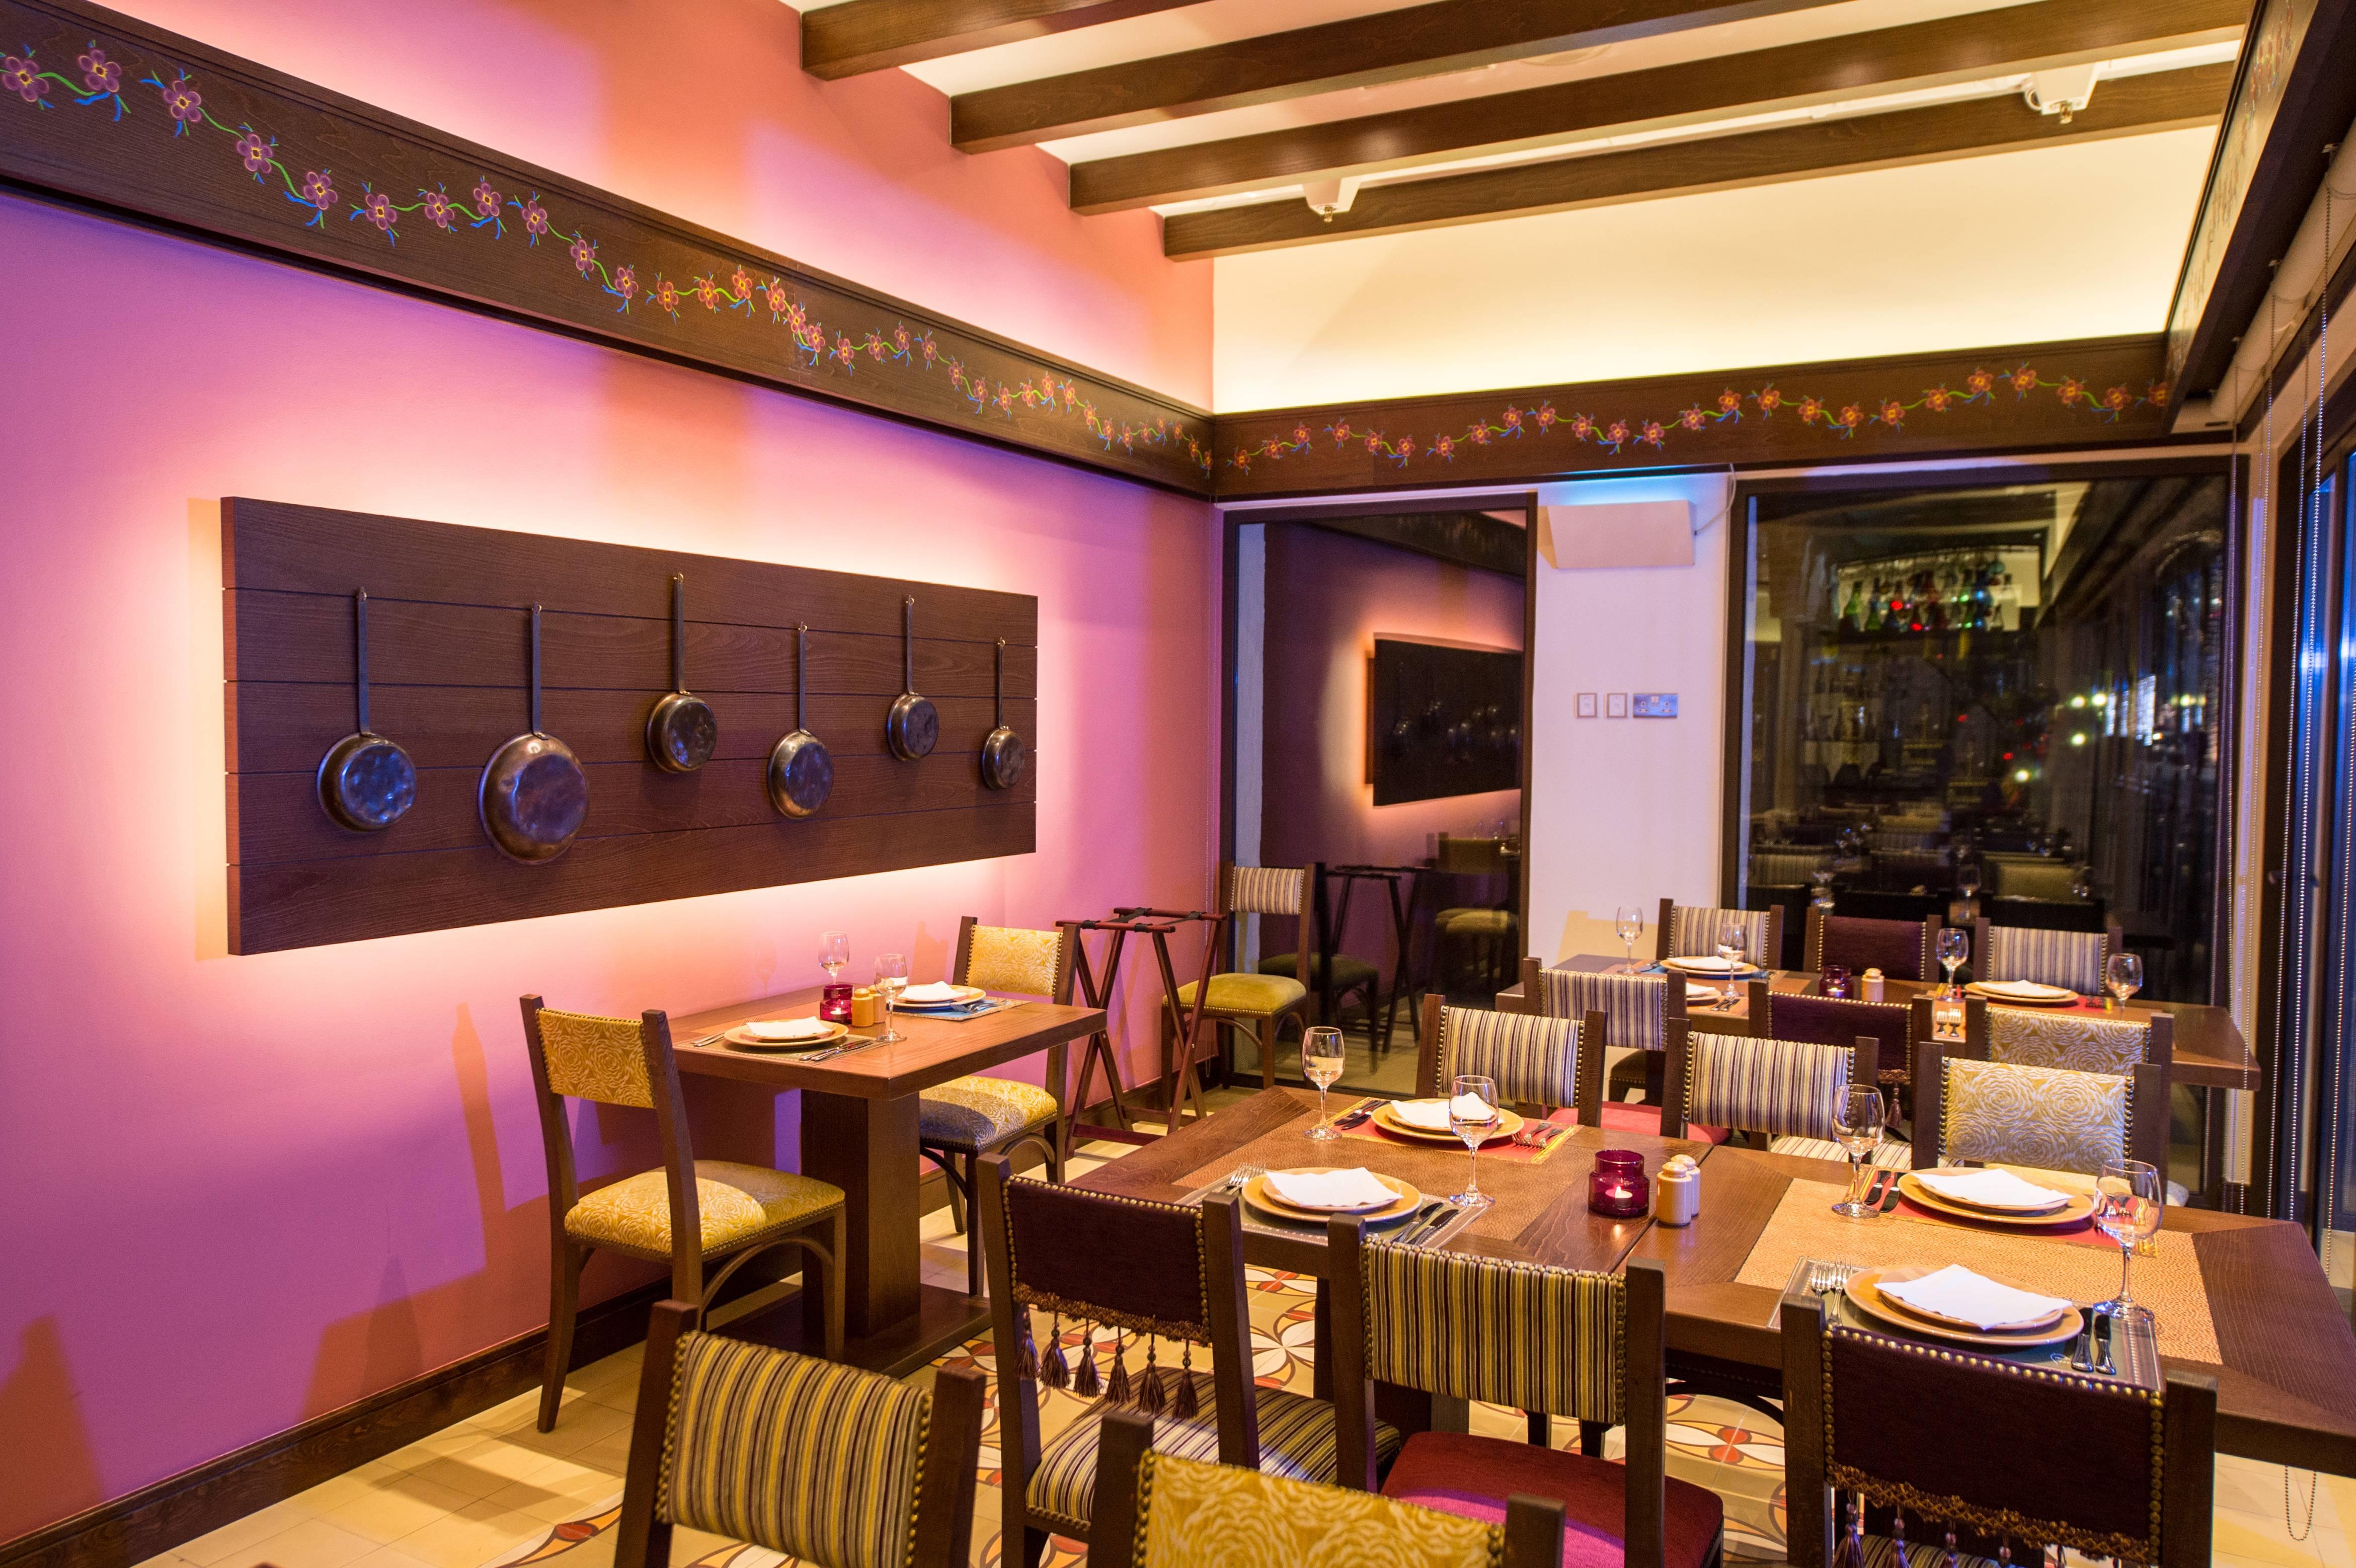 Armenian restaurant mayrig opens in dubai haute living for Armenian cuisine aline kamakian